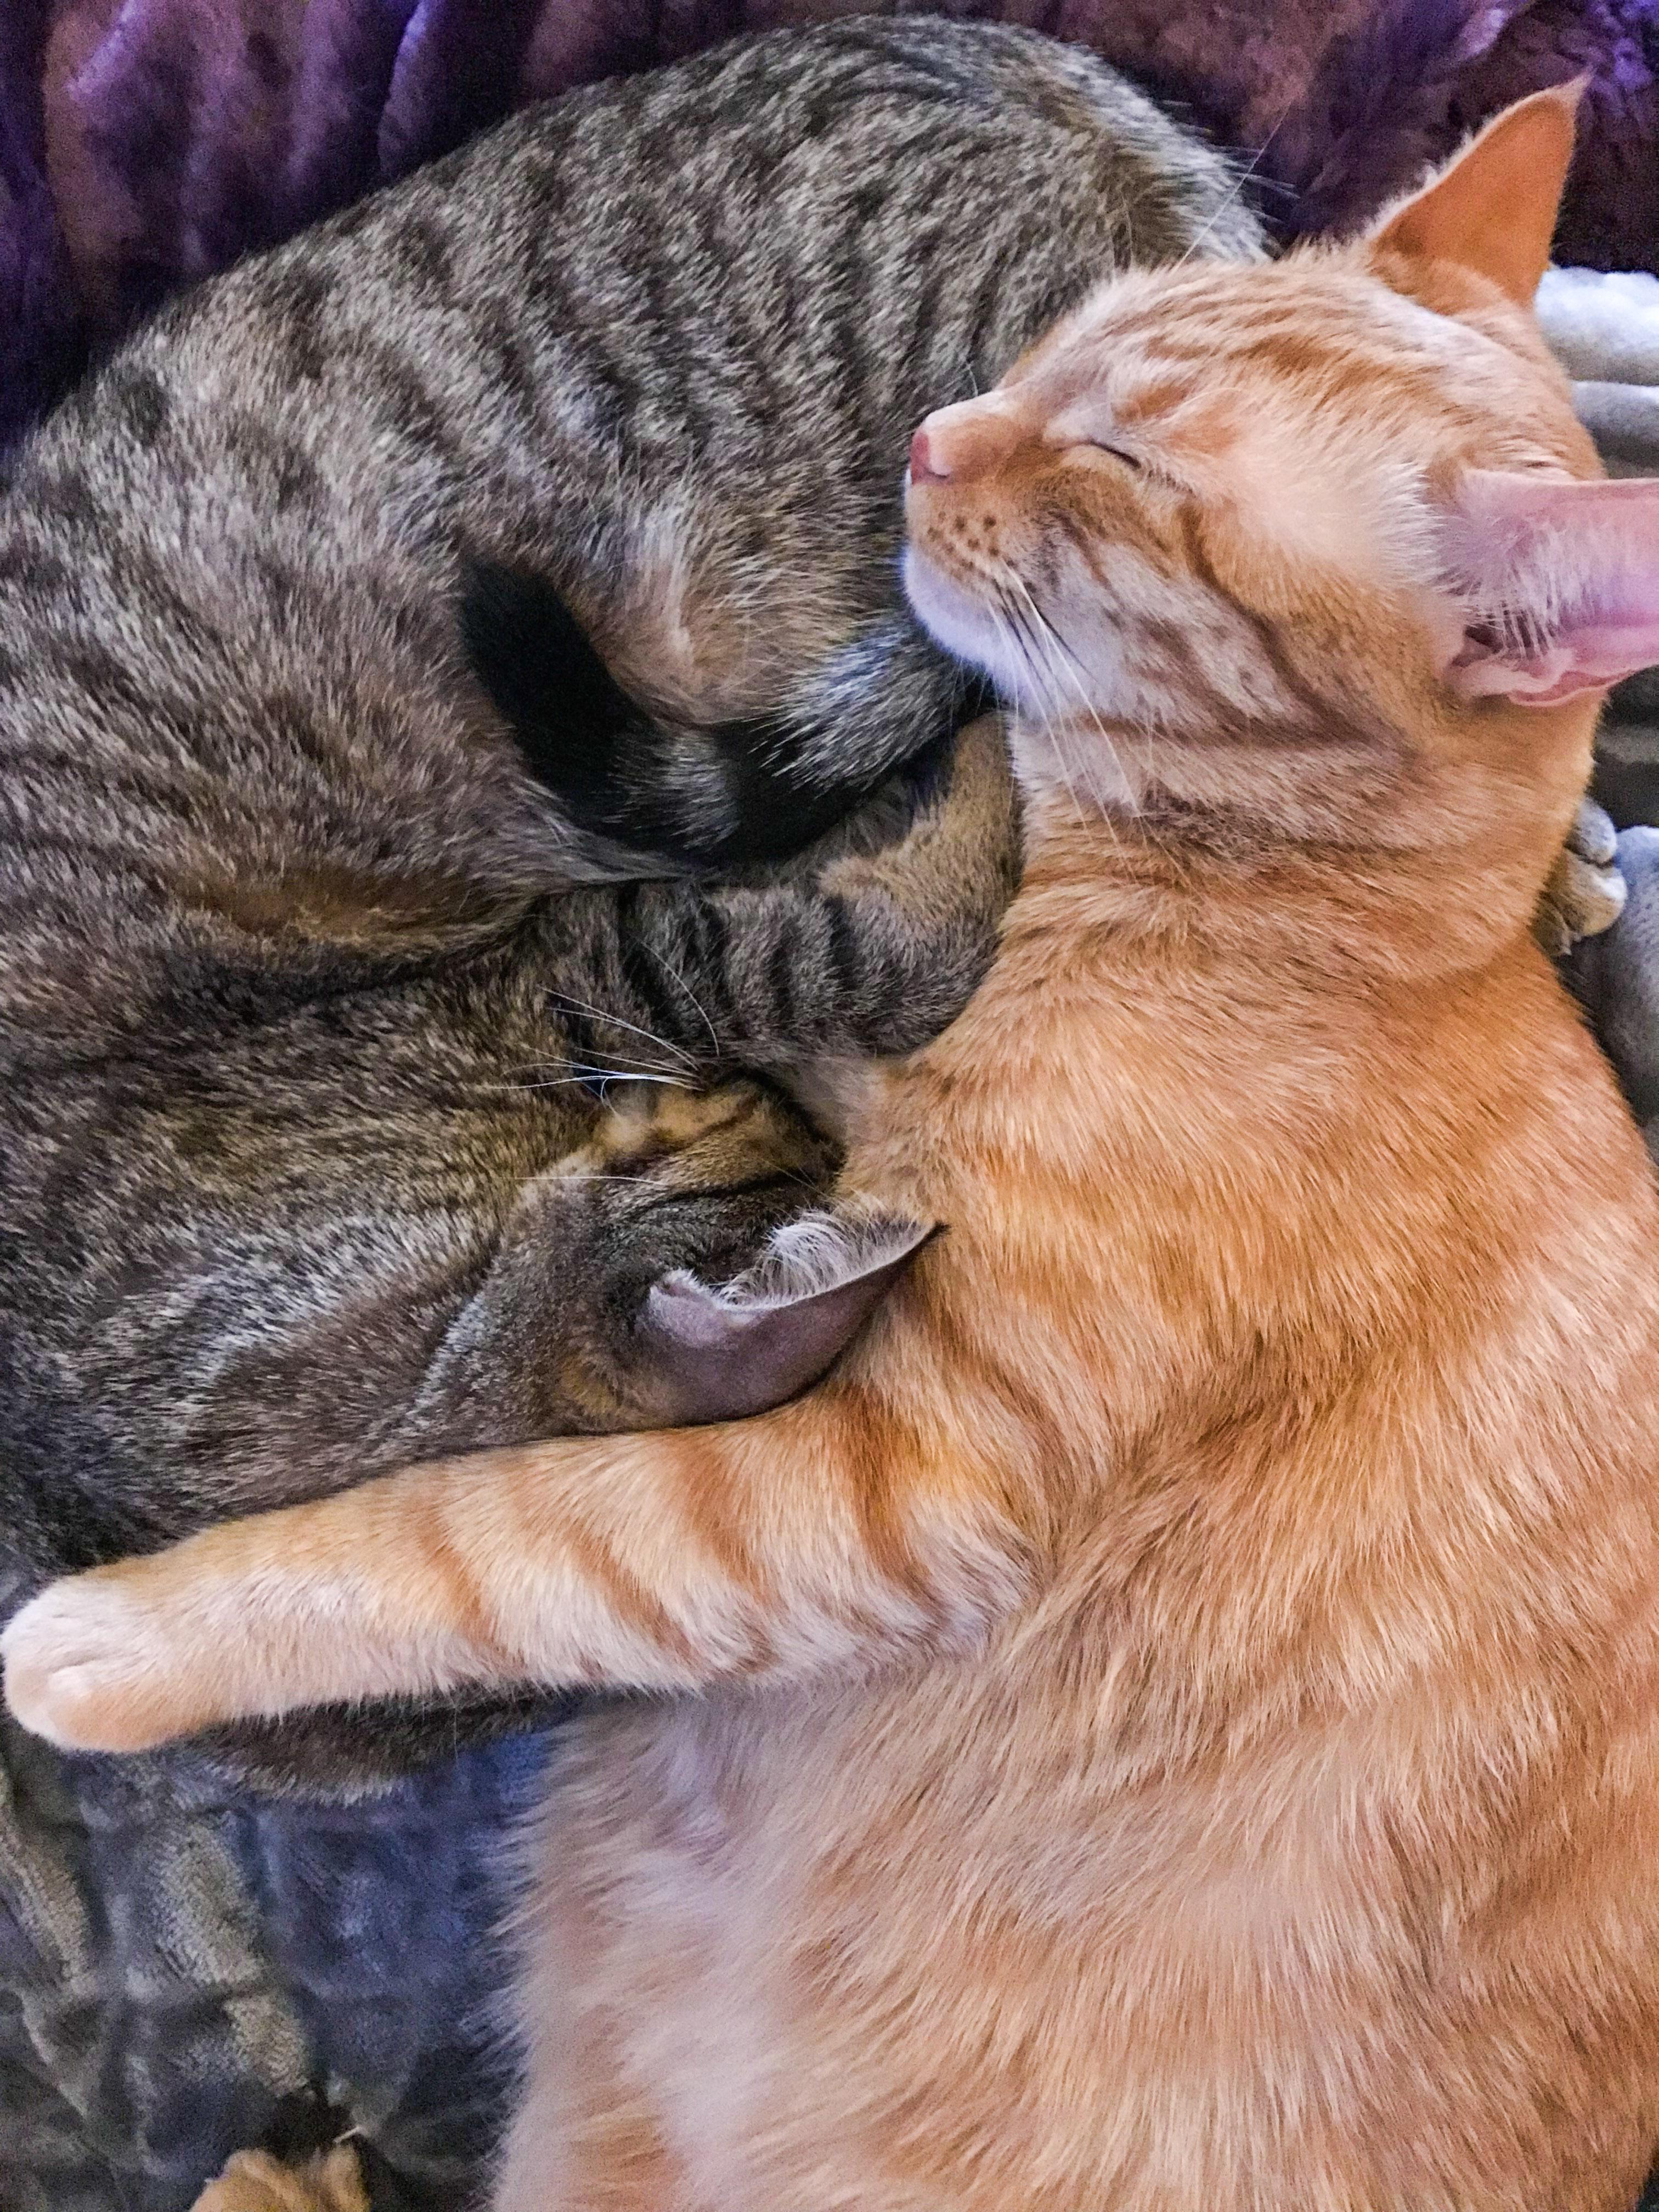 Ranger & Marmalade Curled Together